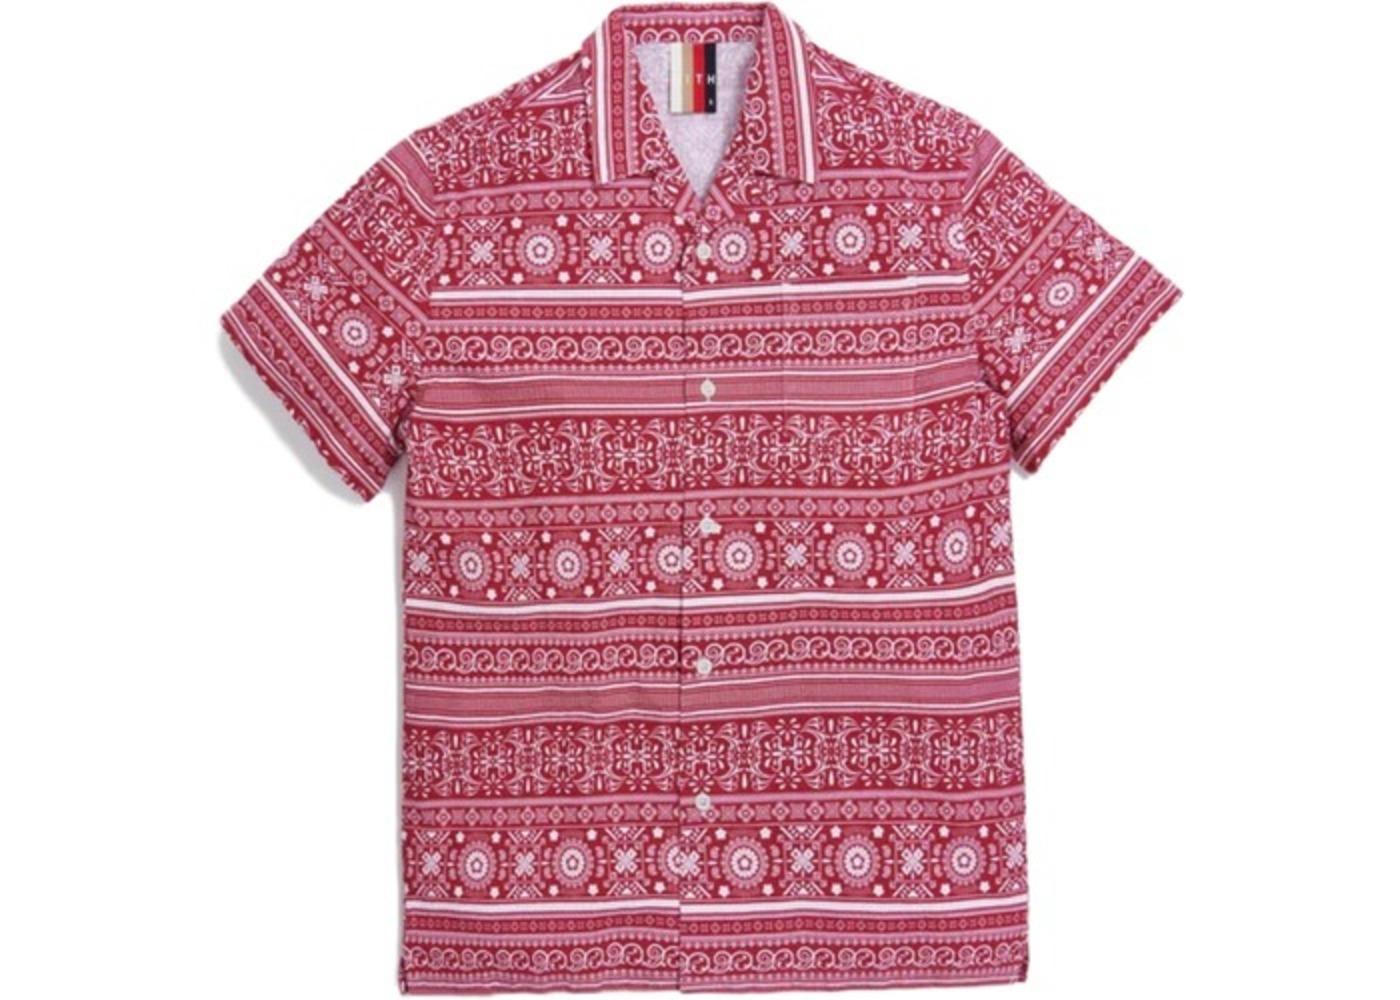 Kith Seersucker Camp Shirt Red/White の写真